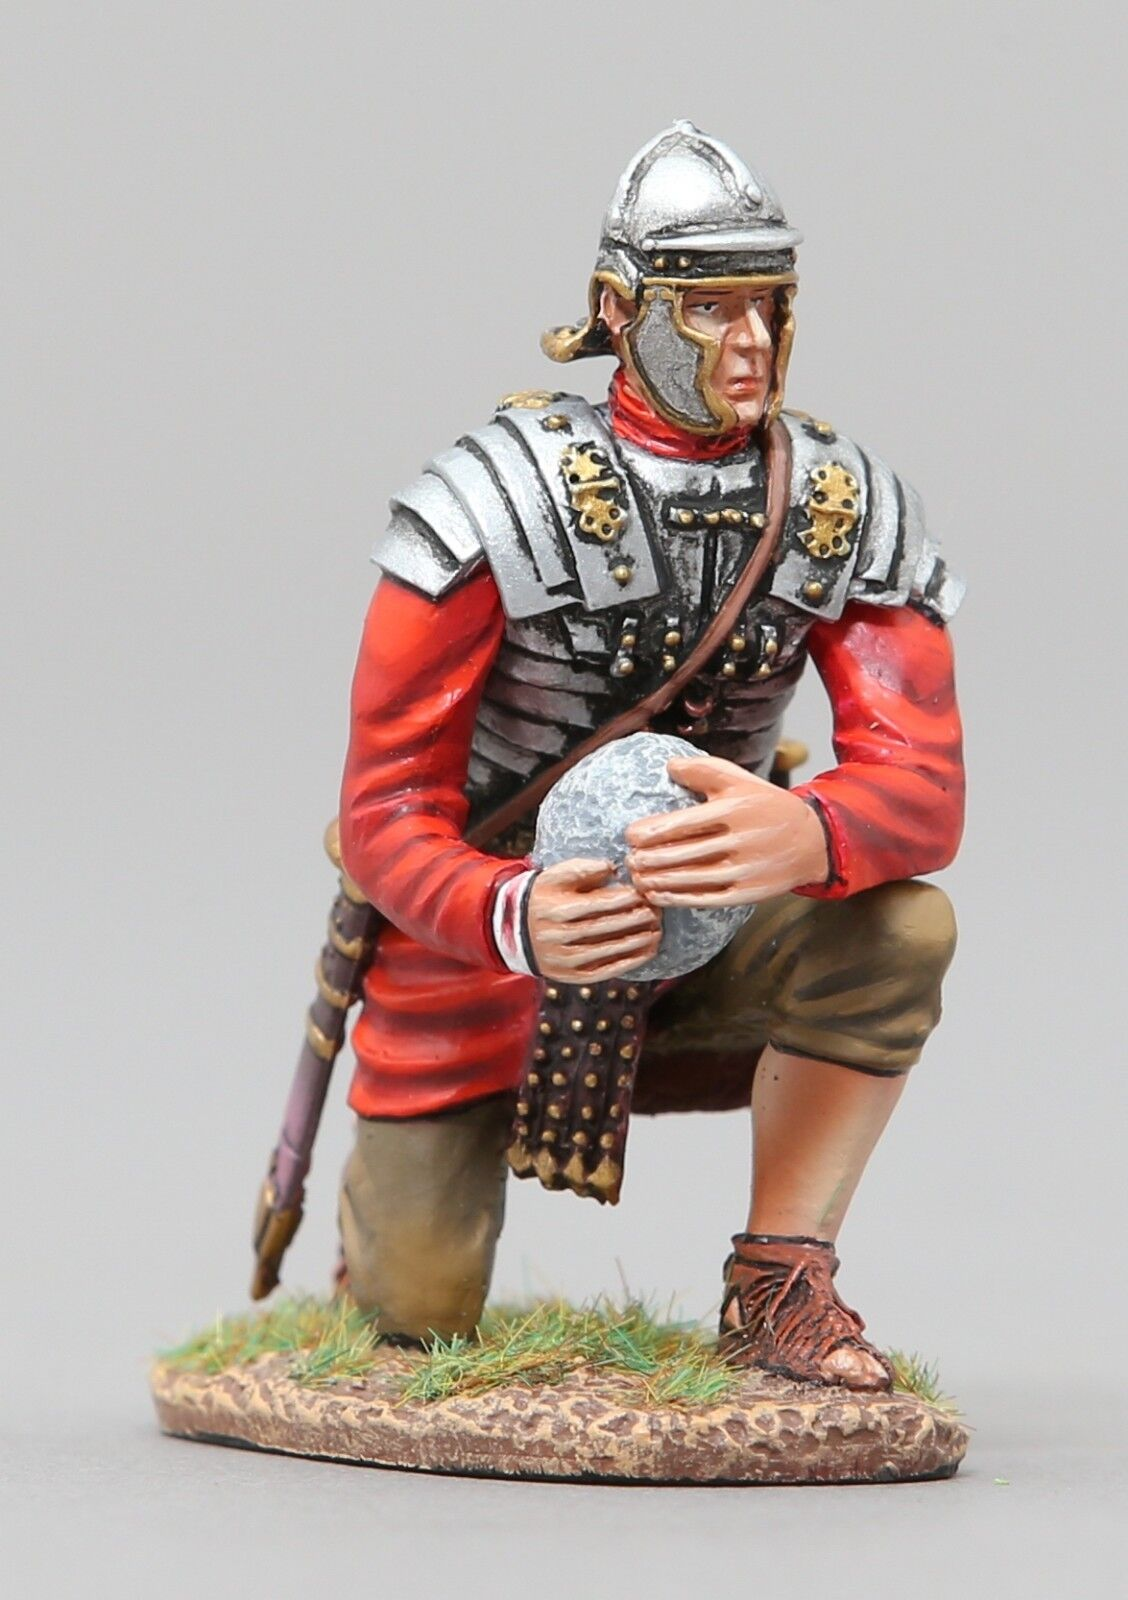 THOMAS GUNN ROMAN EMPIRE ROM104 ROMAN LEGIONNAIRE KNEELING WITH PROJECTILE MIB